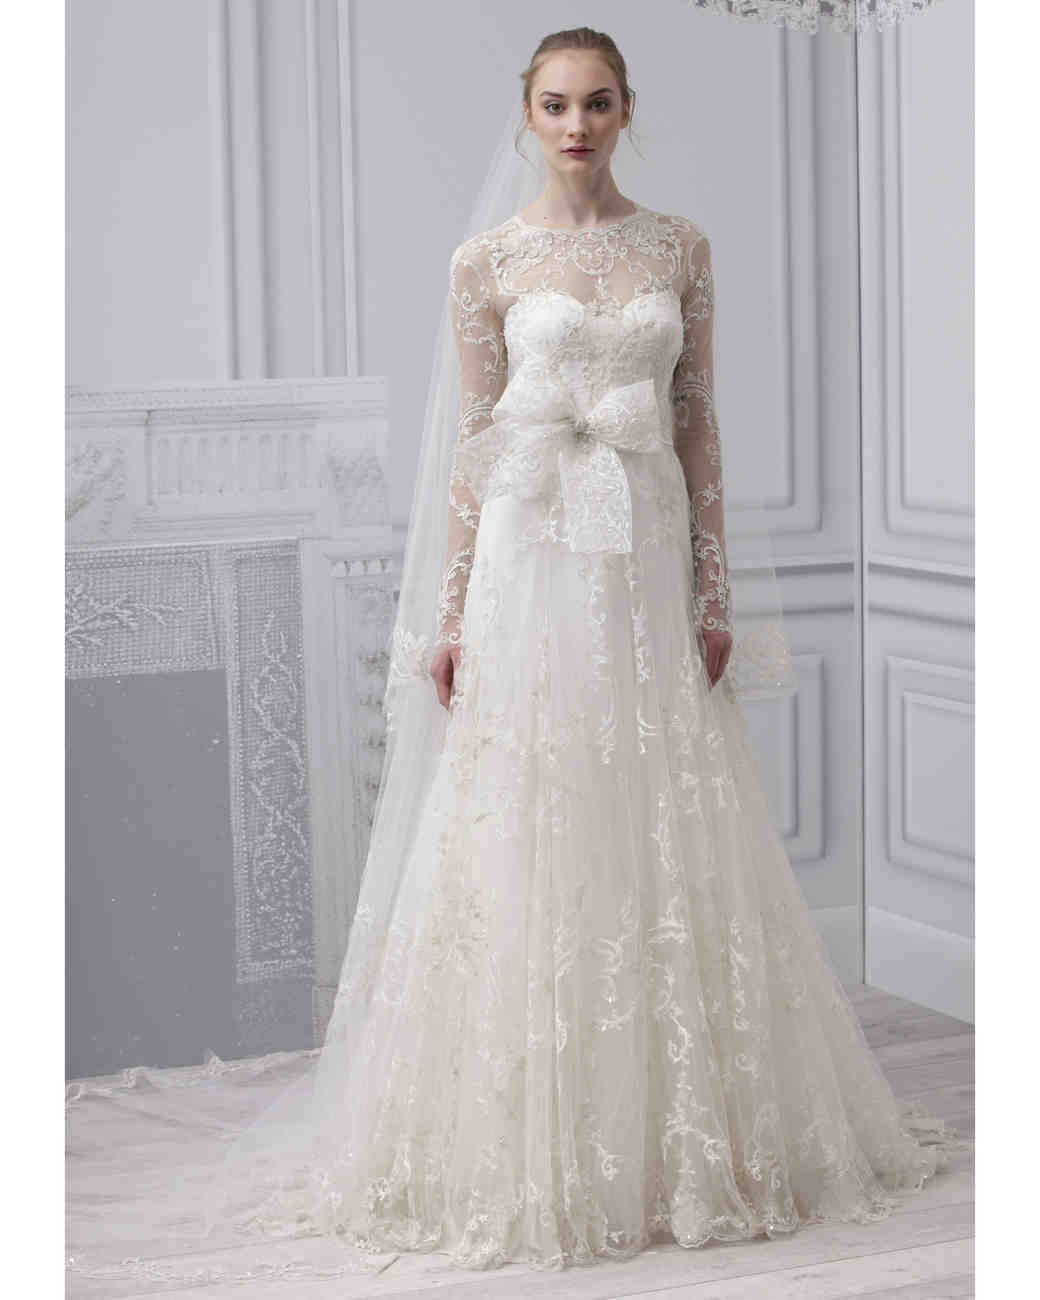 long sleeve wedding dresses spring bridal fashion week long dresses for weddings Monique Lhuillier